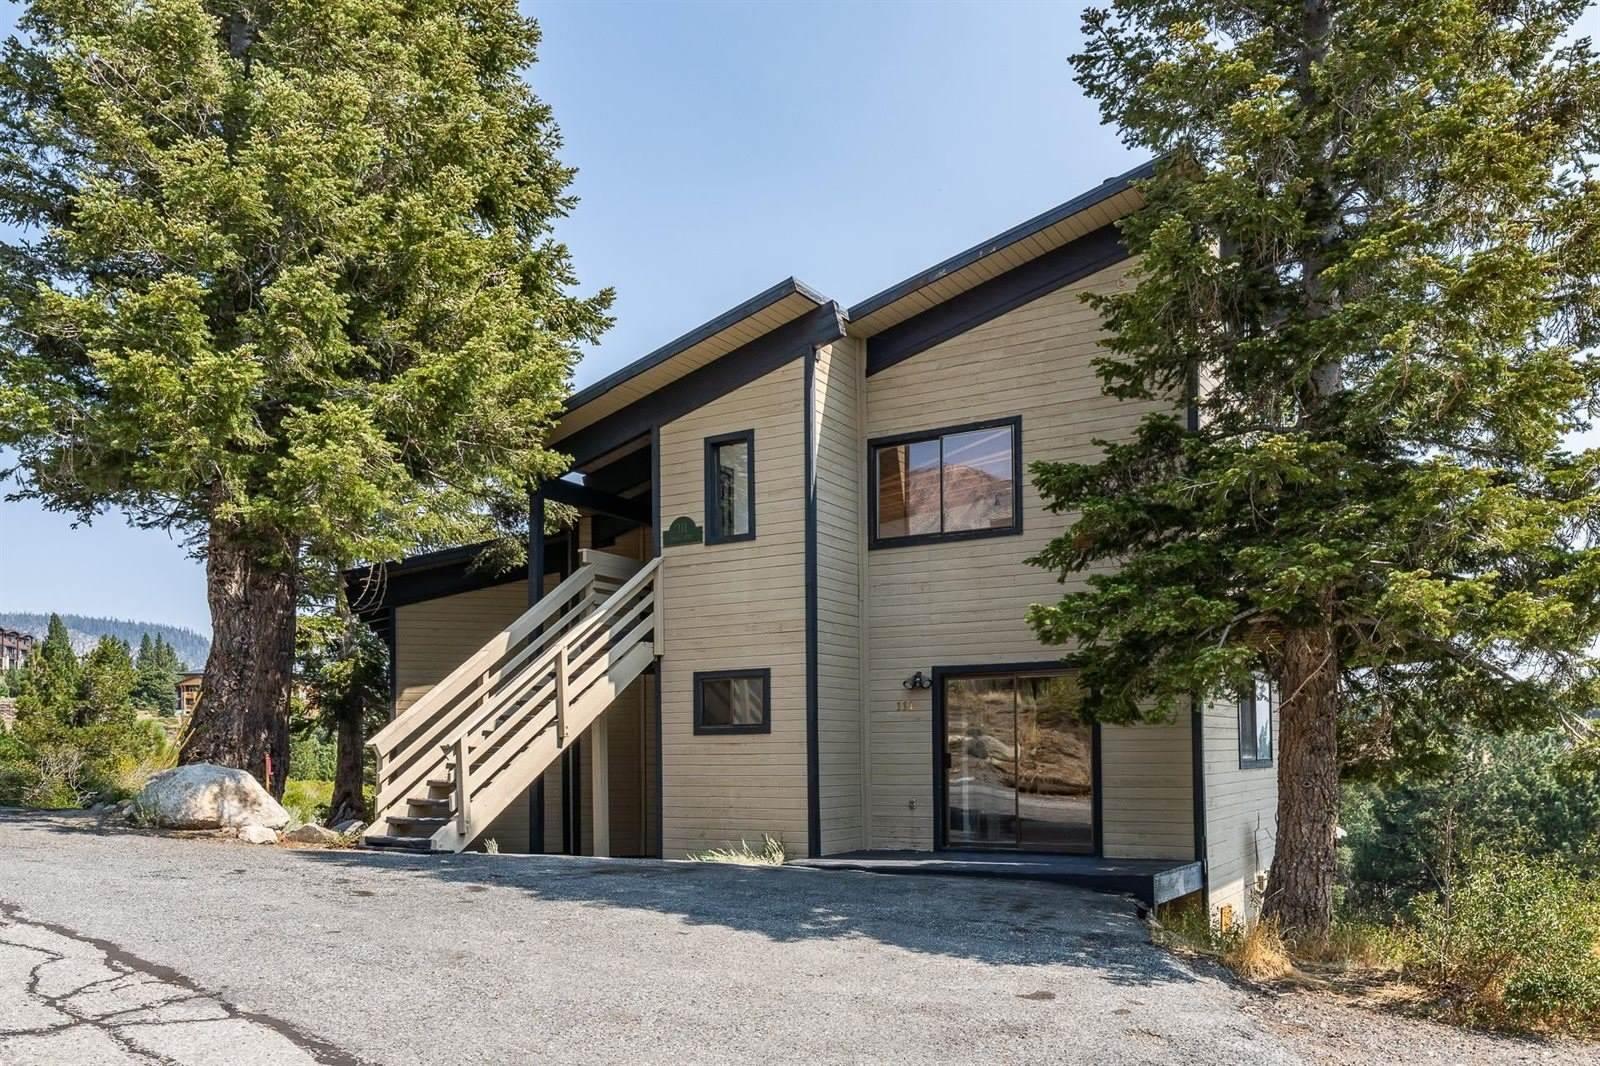 111 North Street, Mammoth Lakes, CA 93546